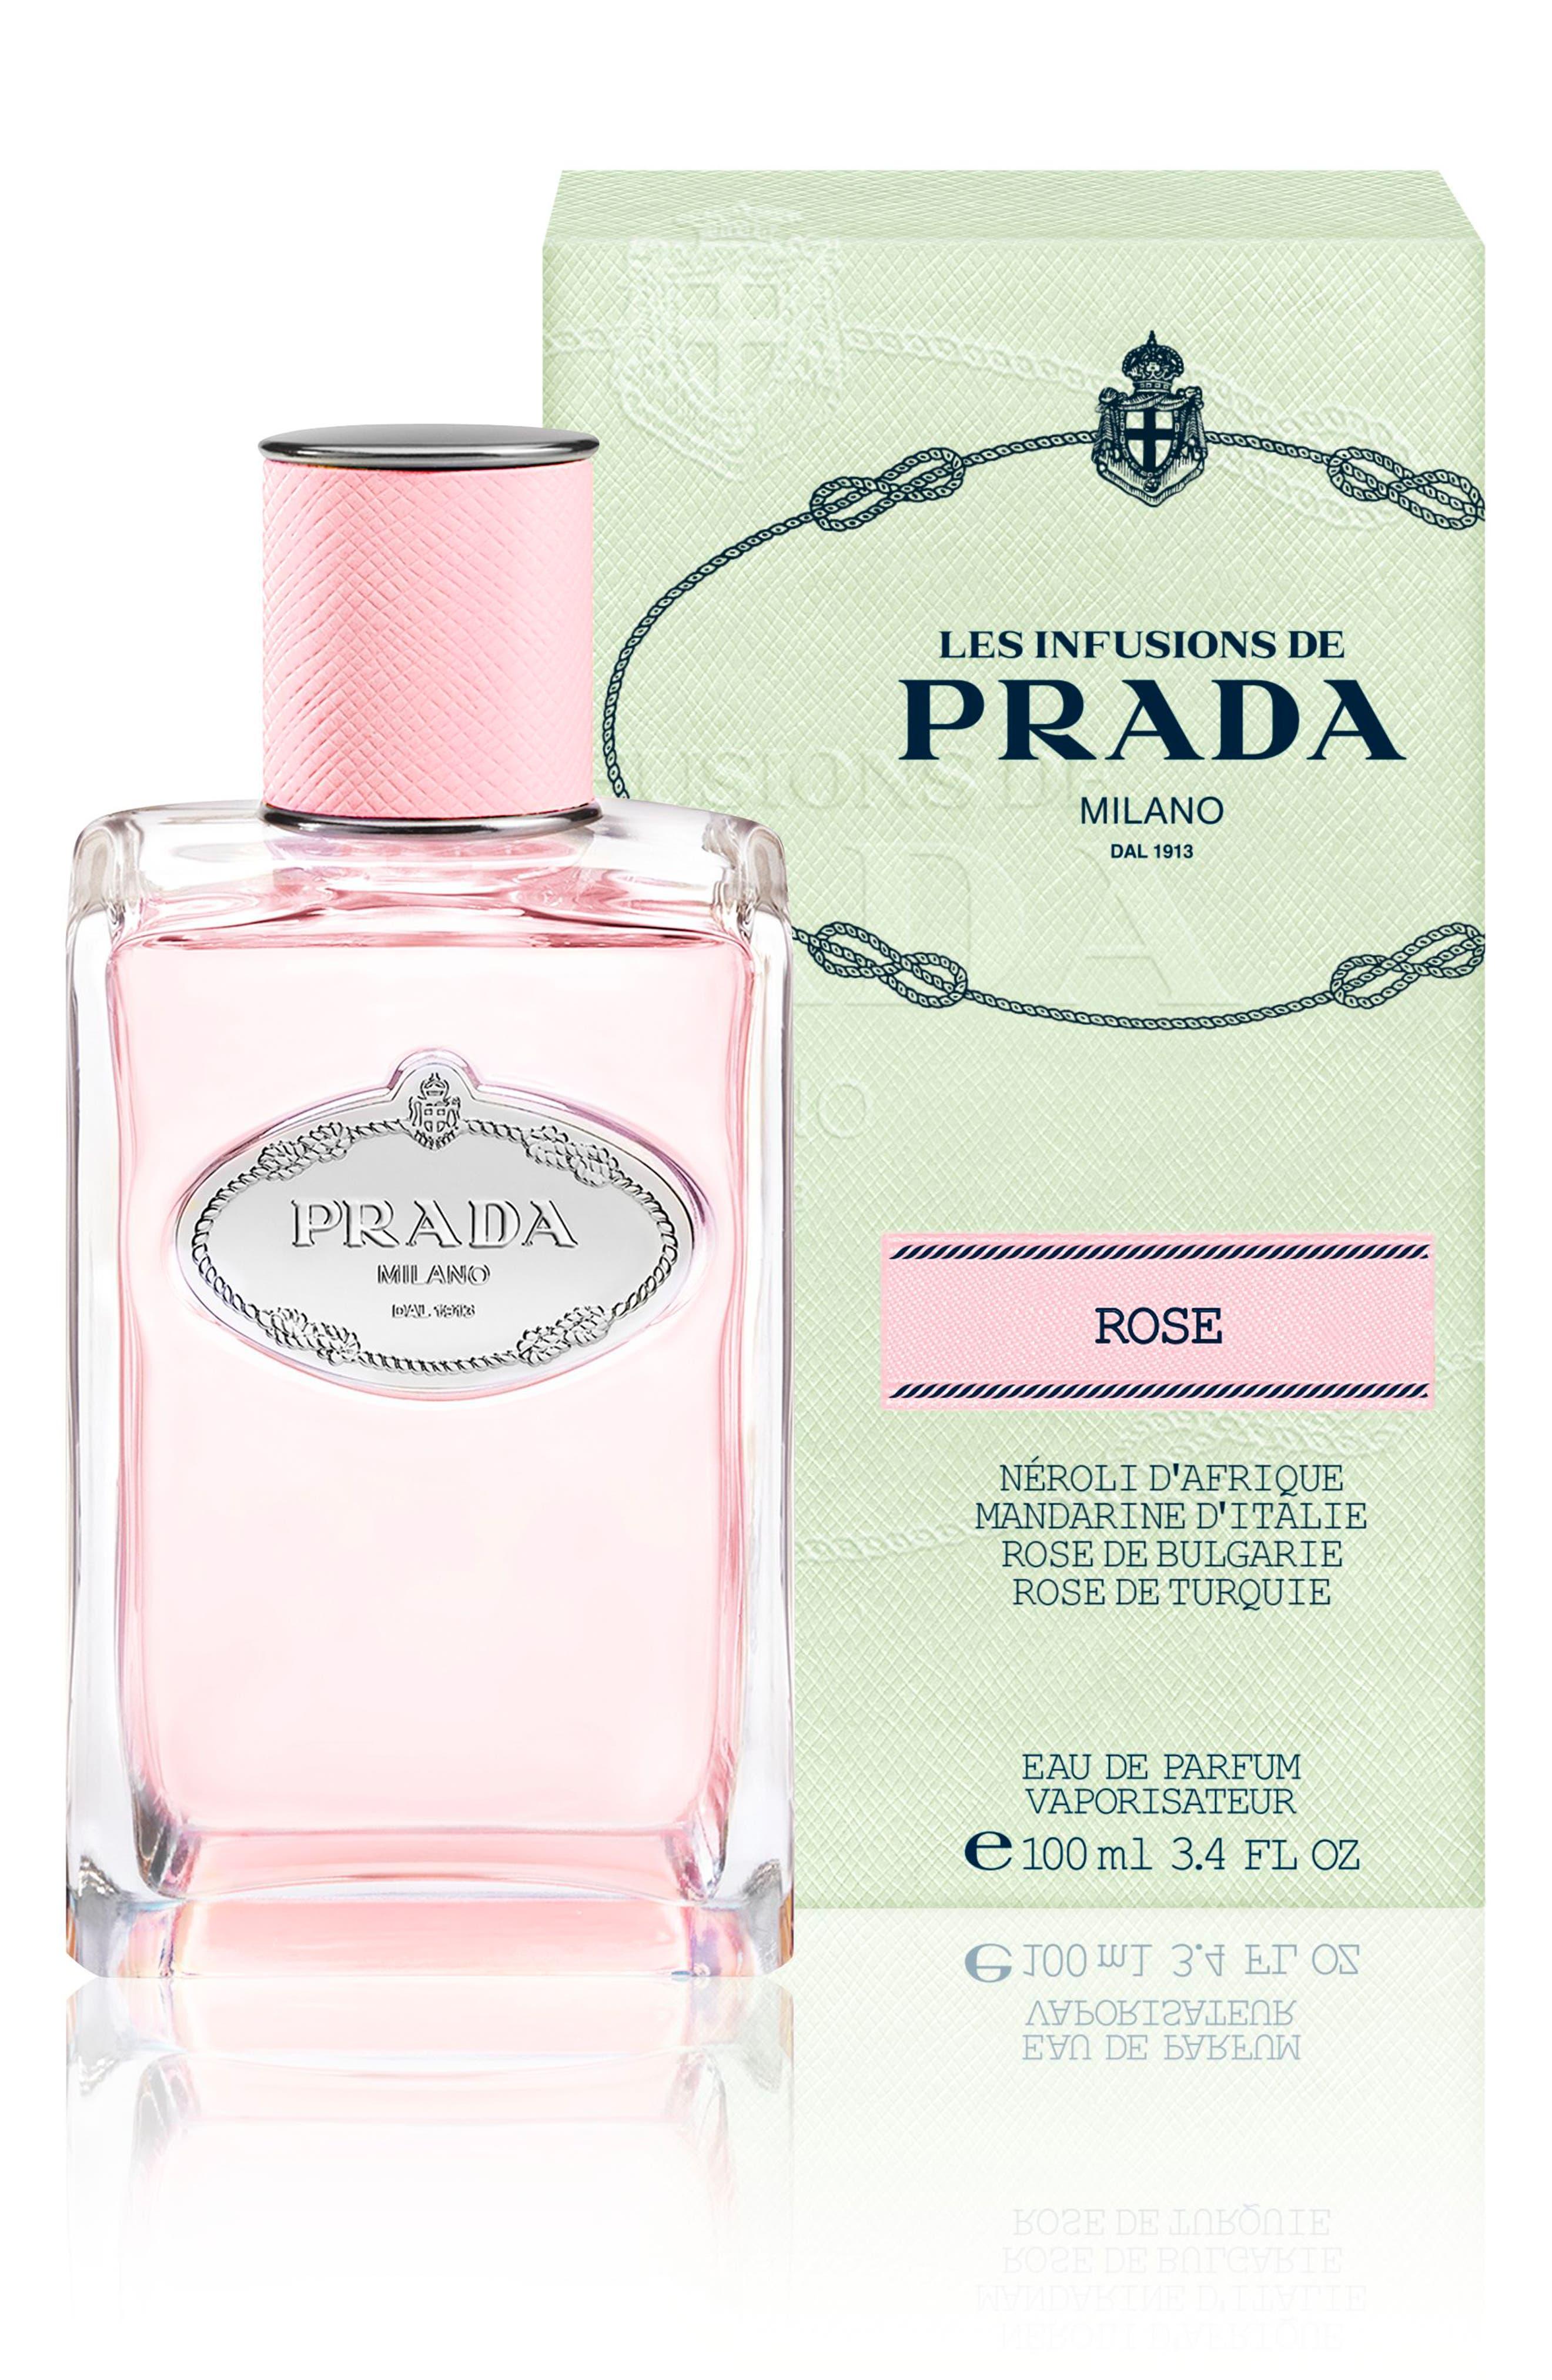 Alternate Image 1 Selected - Prada Les Infusions de Prada Rose Eau de Parfum